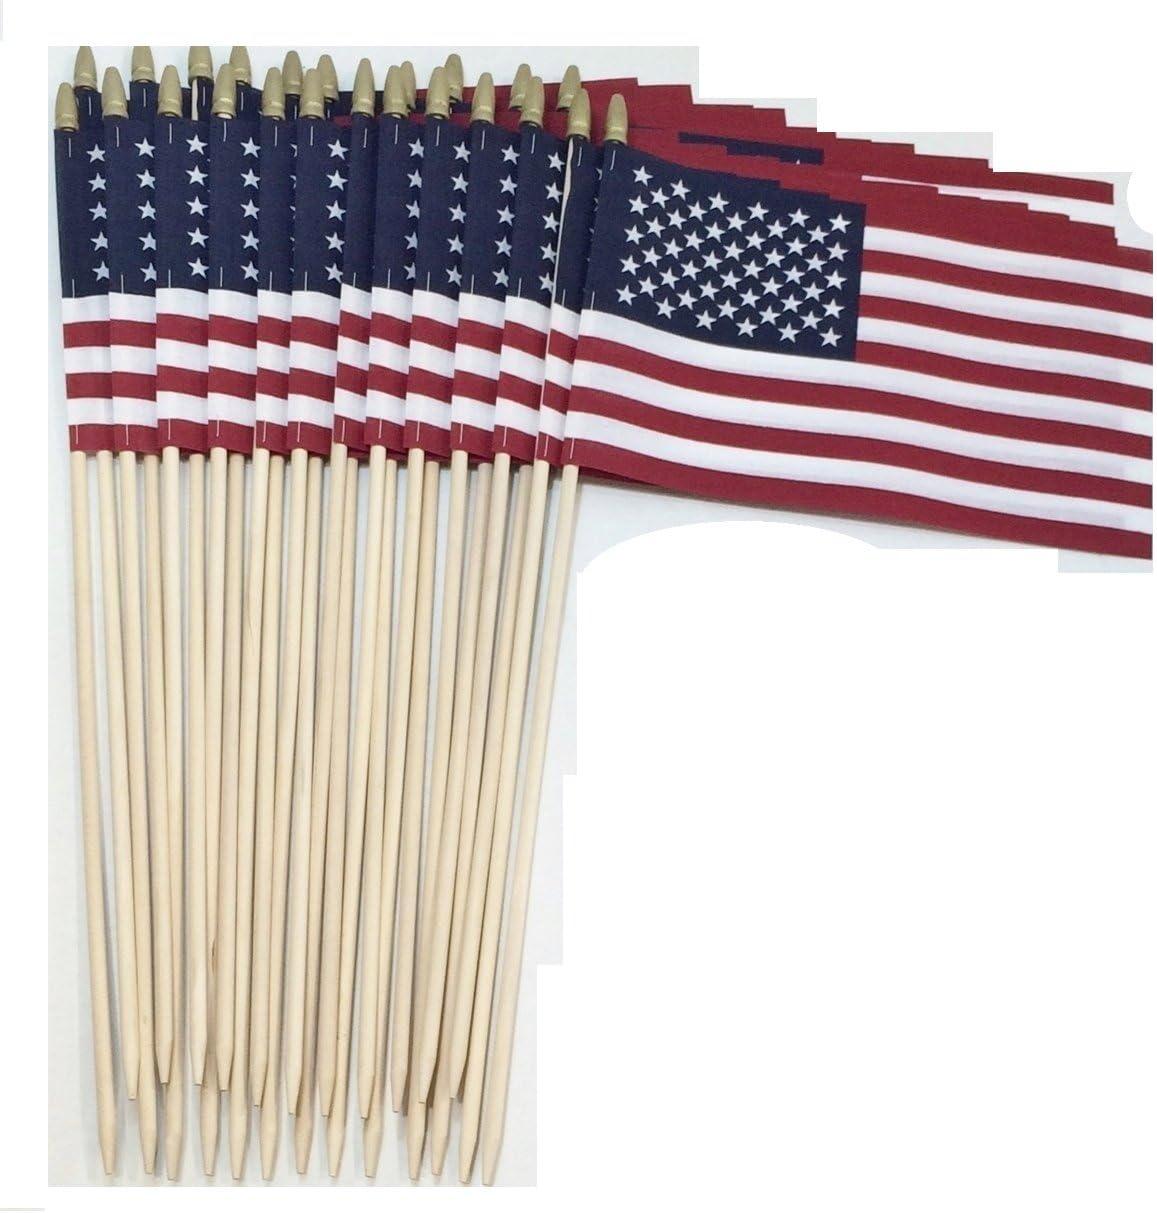 United States of America USA US 4x6in Stick Flag mini desk gold spear-tip each